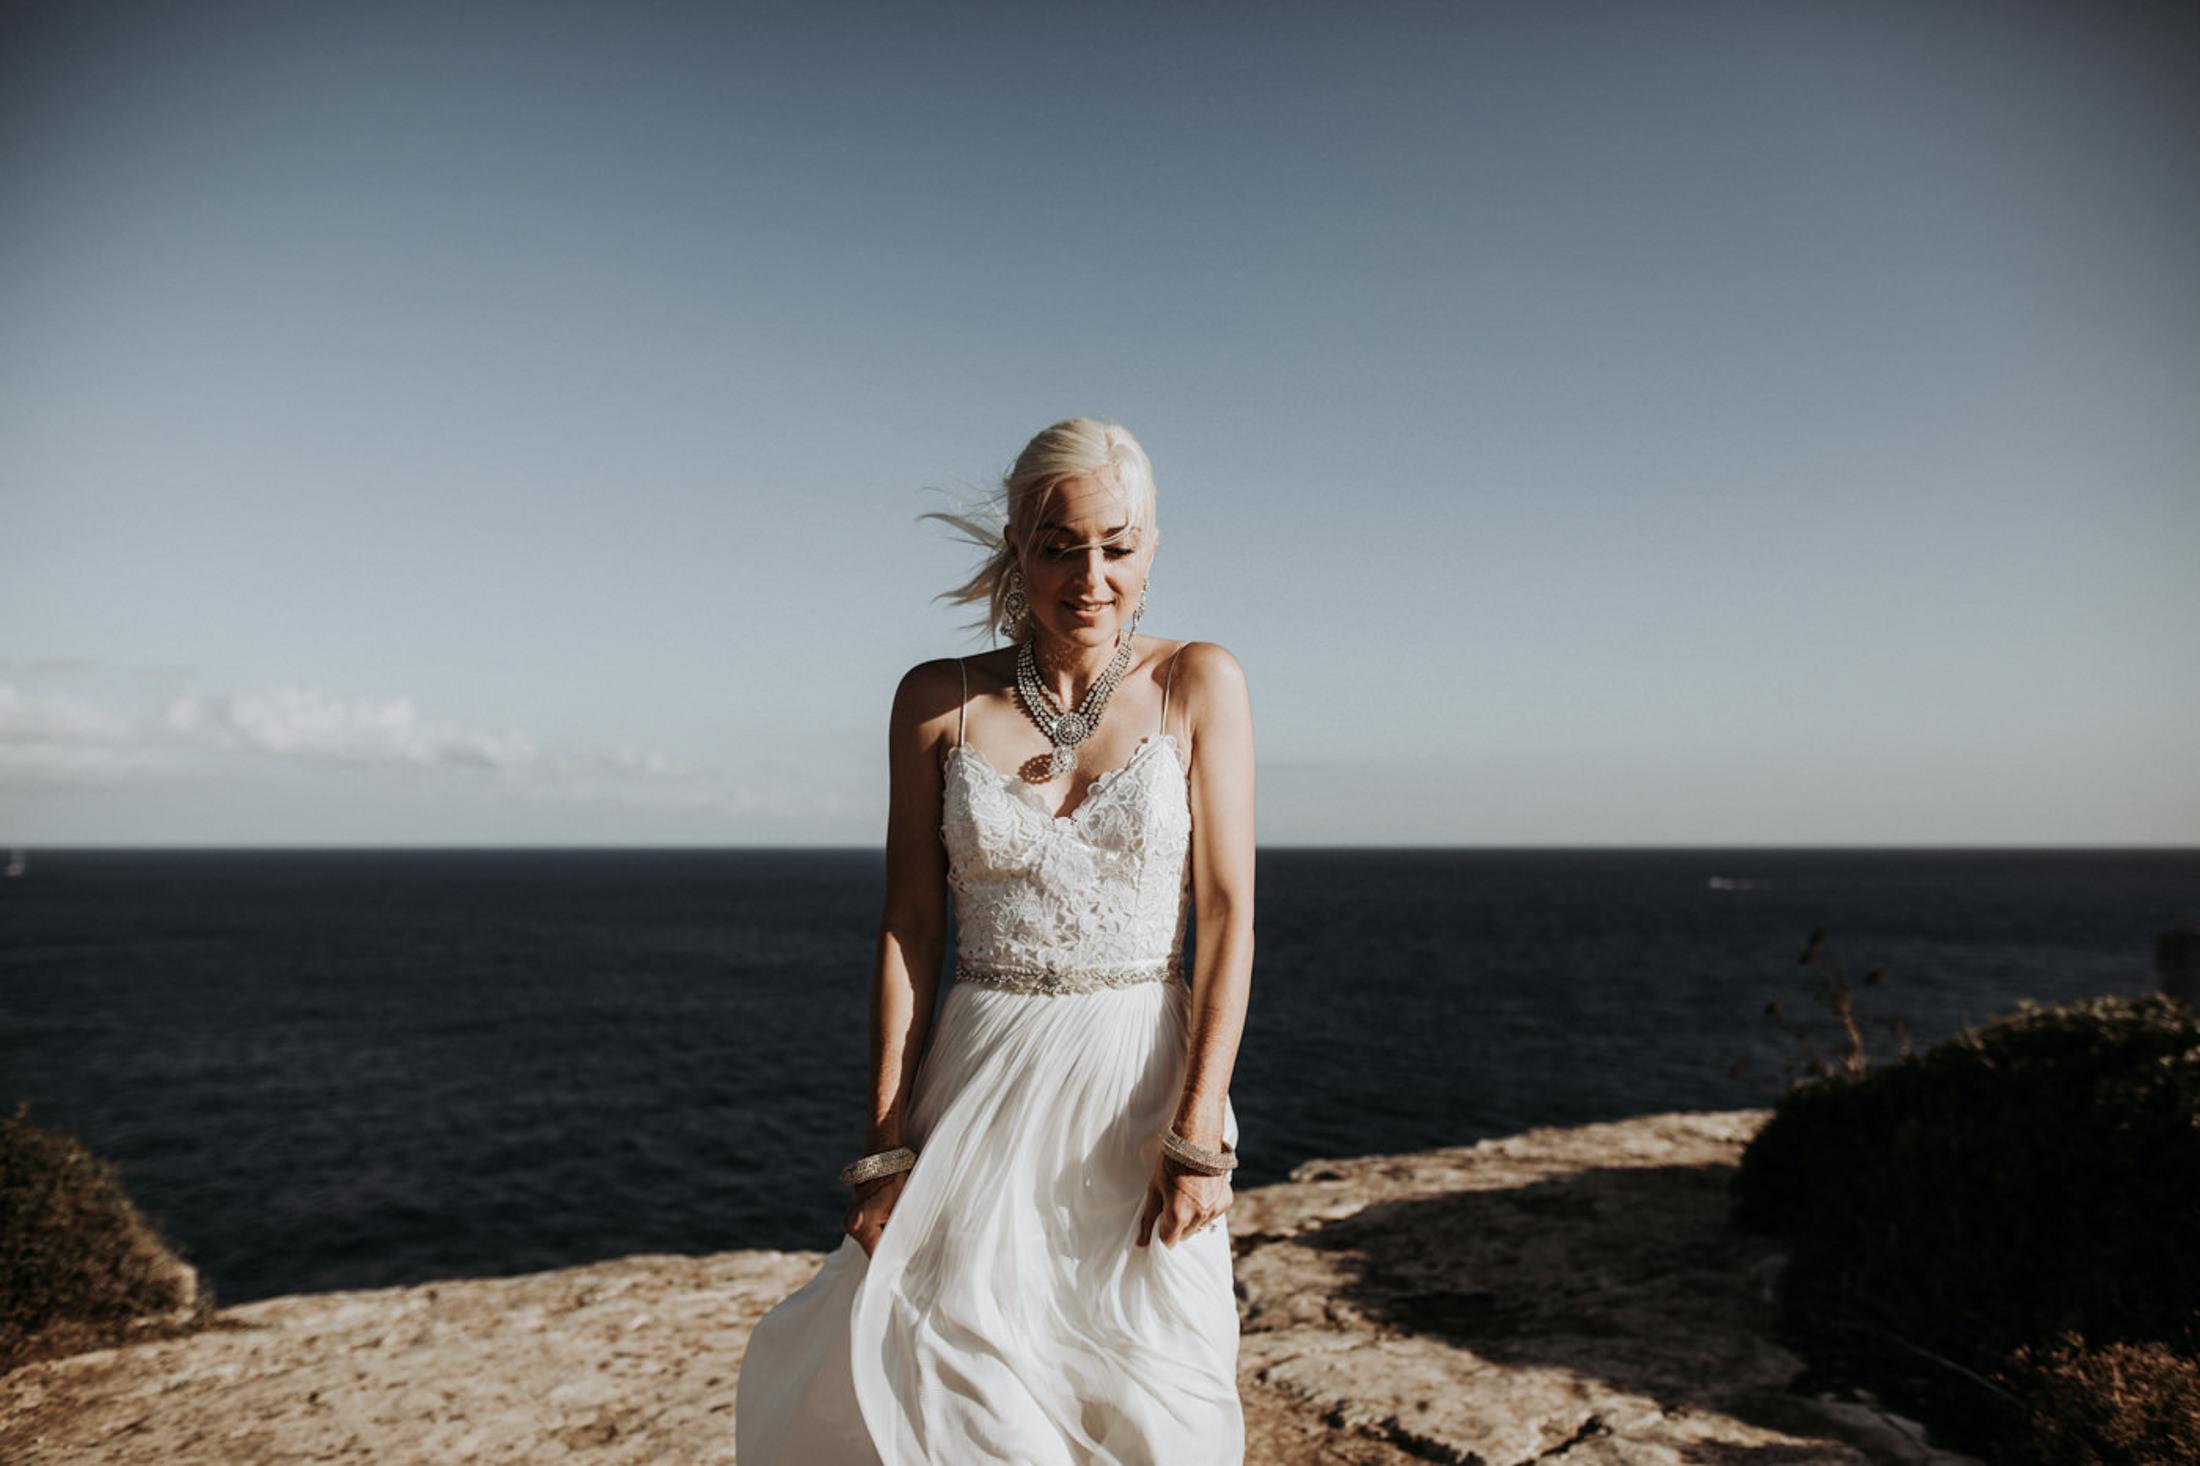 Wedding_Photographer_Mallorca_Daniela-Marquardt_Photography_New_York_Iceland_Tuscany_Santorini_Portugal_Austria_Bavaria_Elopement_Hochzeitsfotograf_AntjeRajat2_84